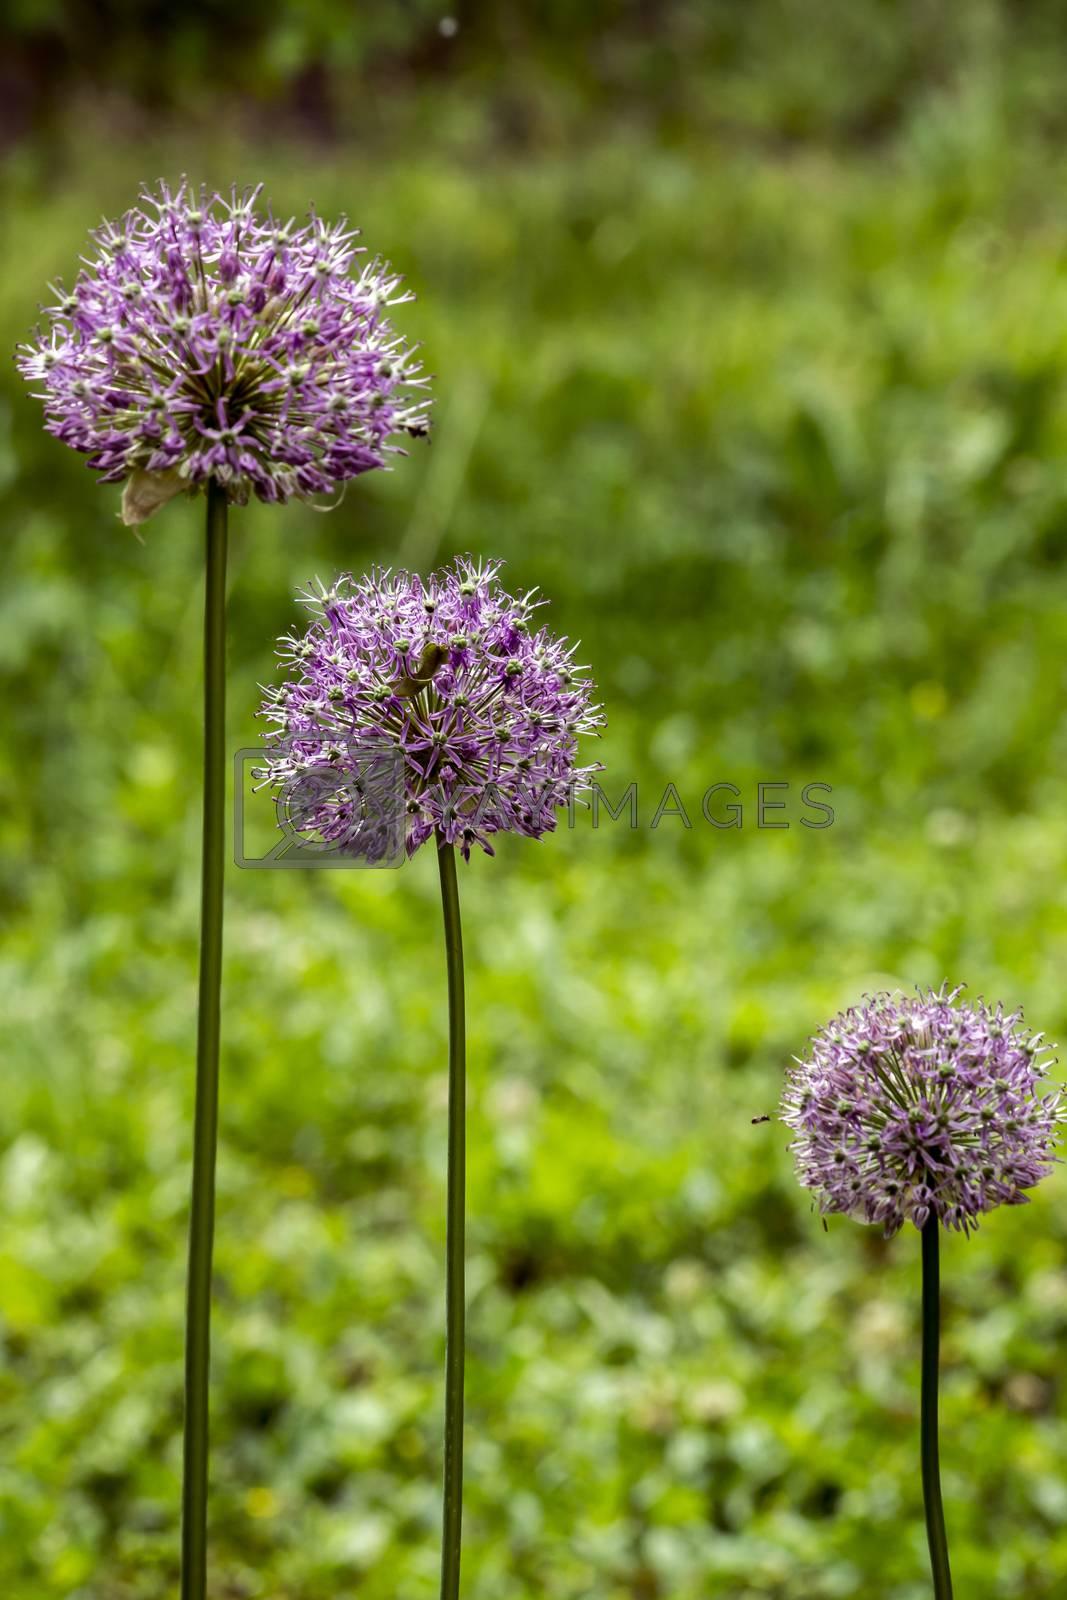 The giant ornamental onion (Allium giganteum) spring buds.